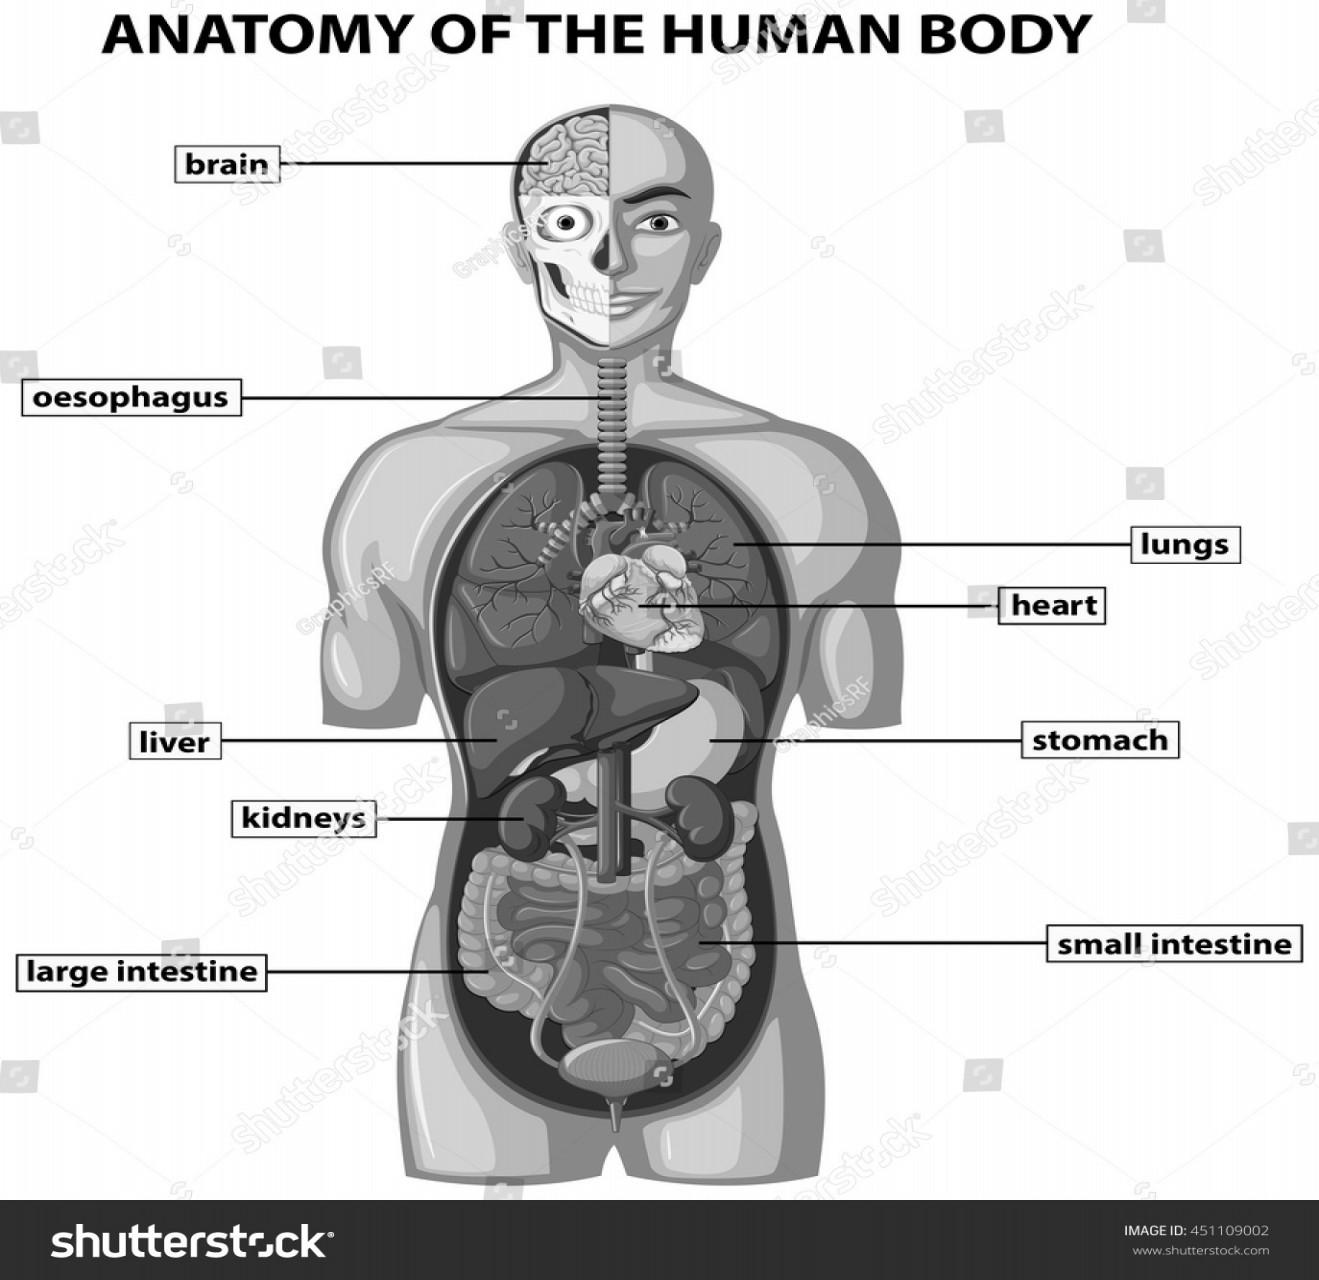 Body Organs Diagram Anatomy Of Body Showing Organs Steven Hill